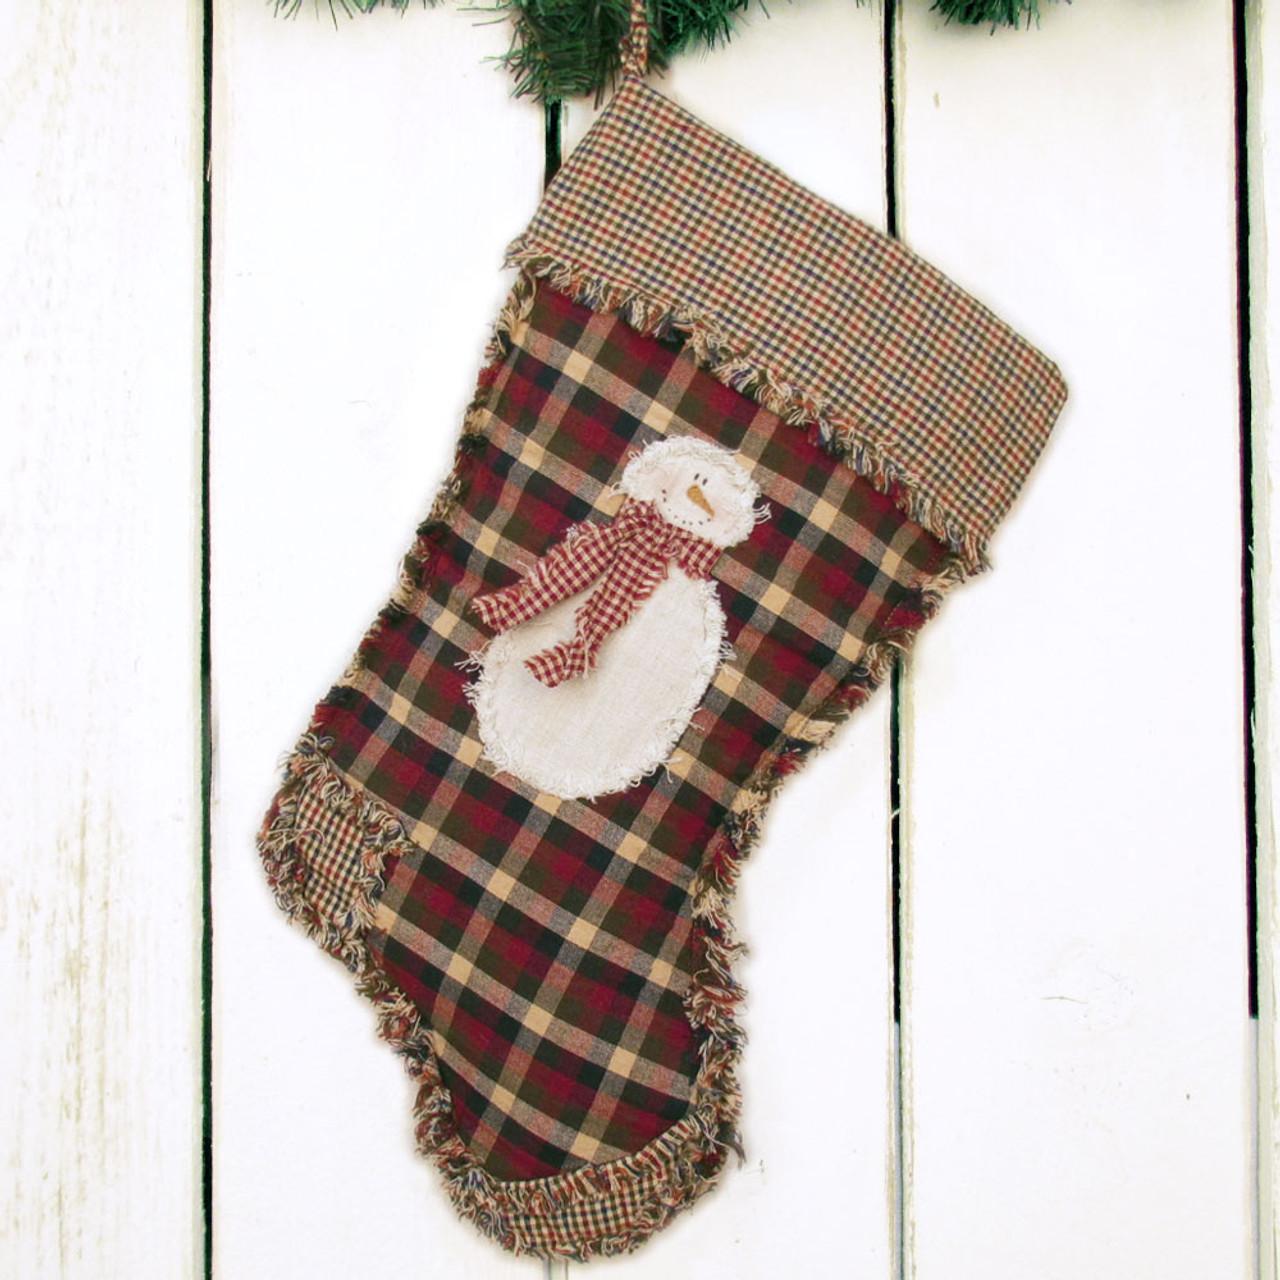 Ragged Christmas Stocking Pattern - Printed